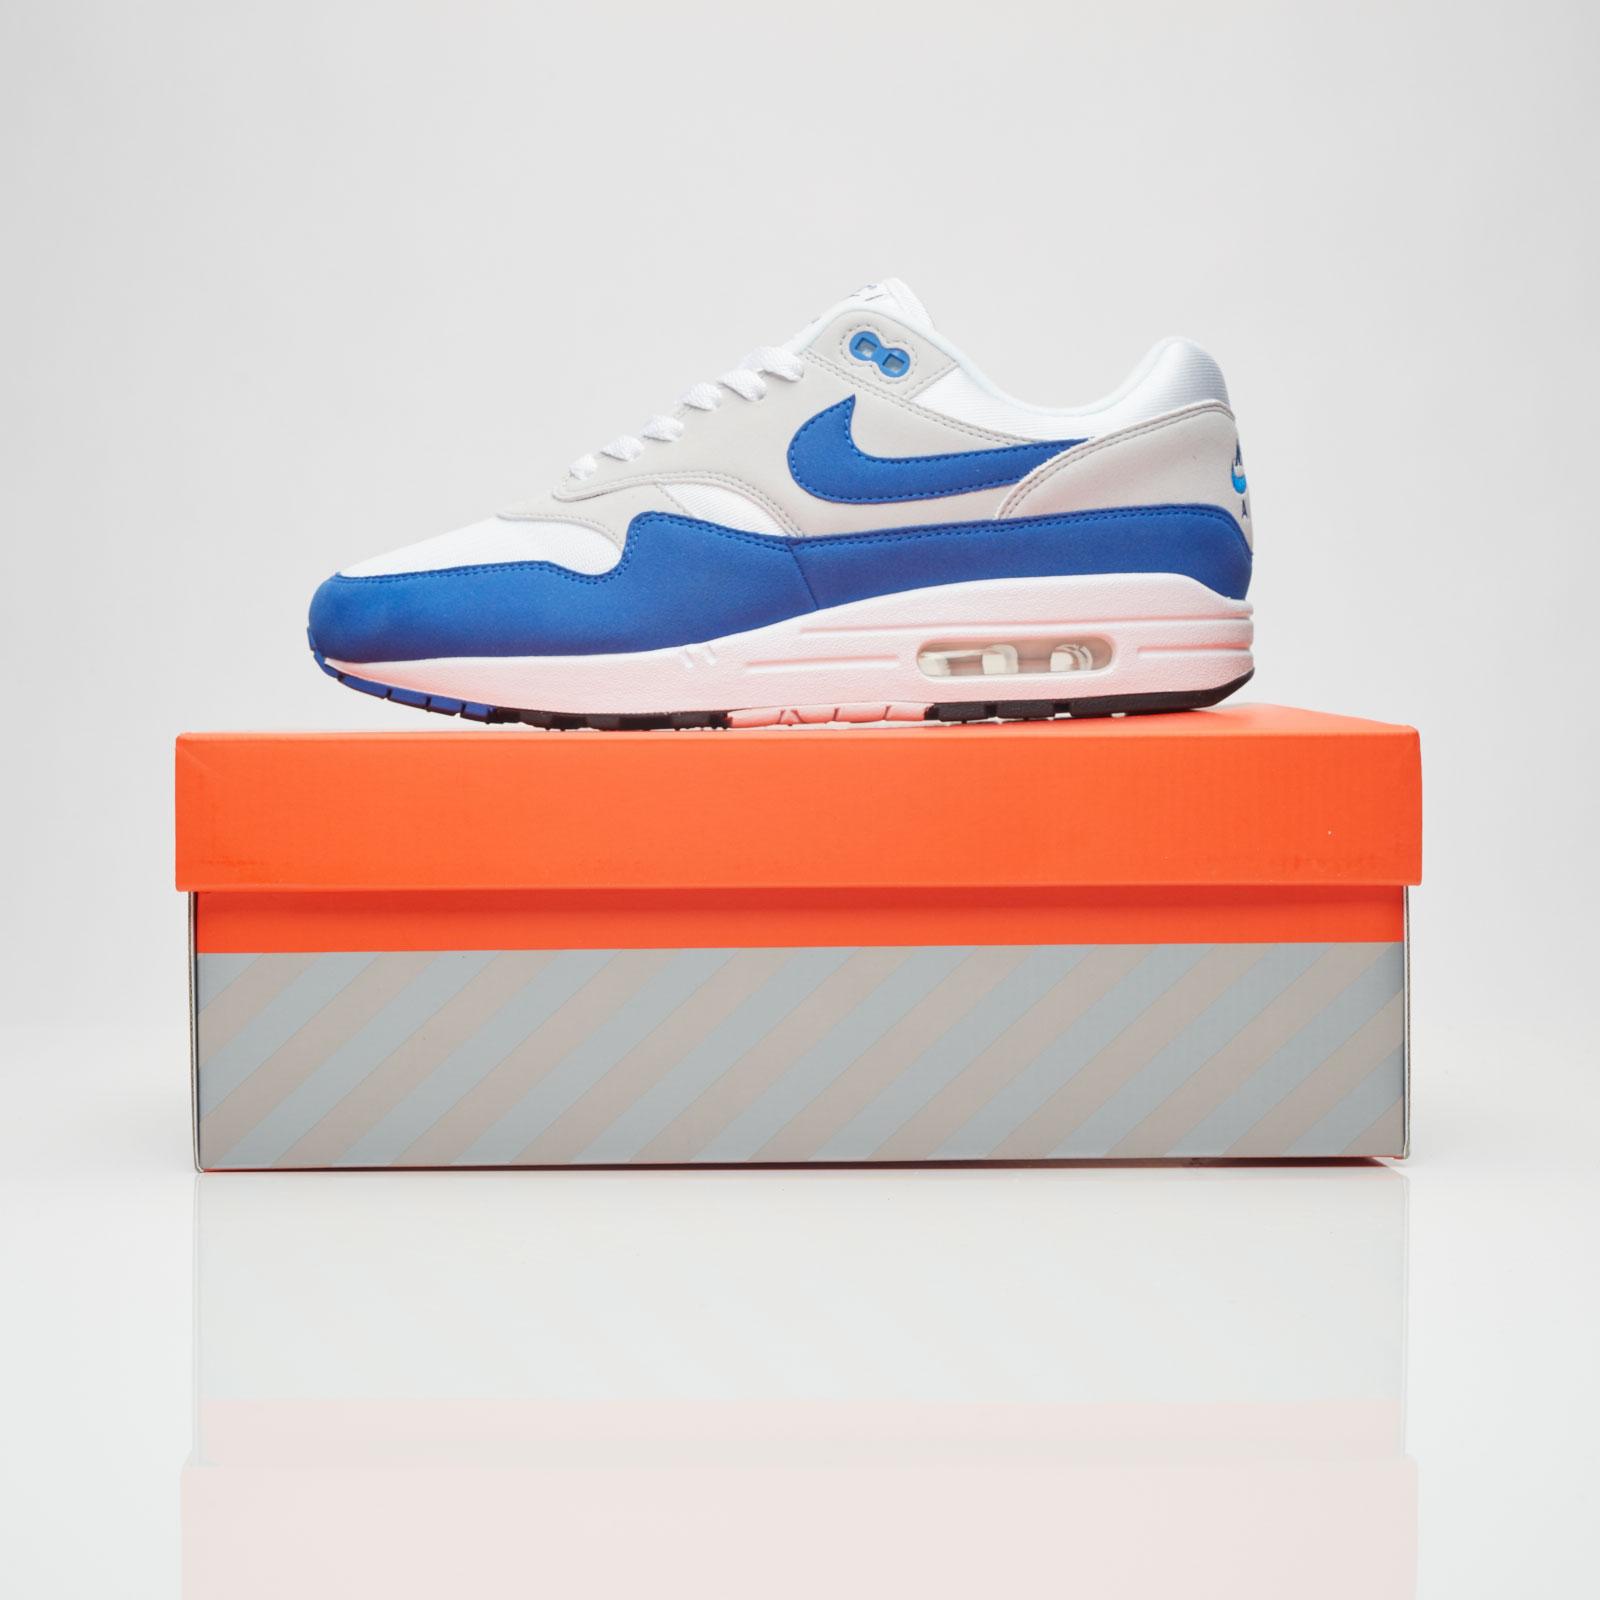 Nike Air Max 1 Anniversary 908375 101 Chaussuressnstuff Chaussuress